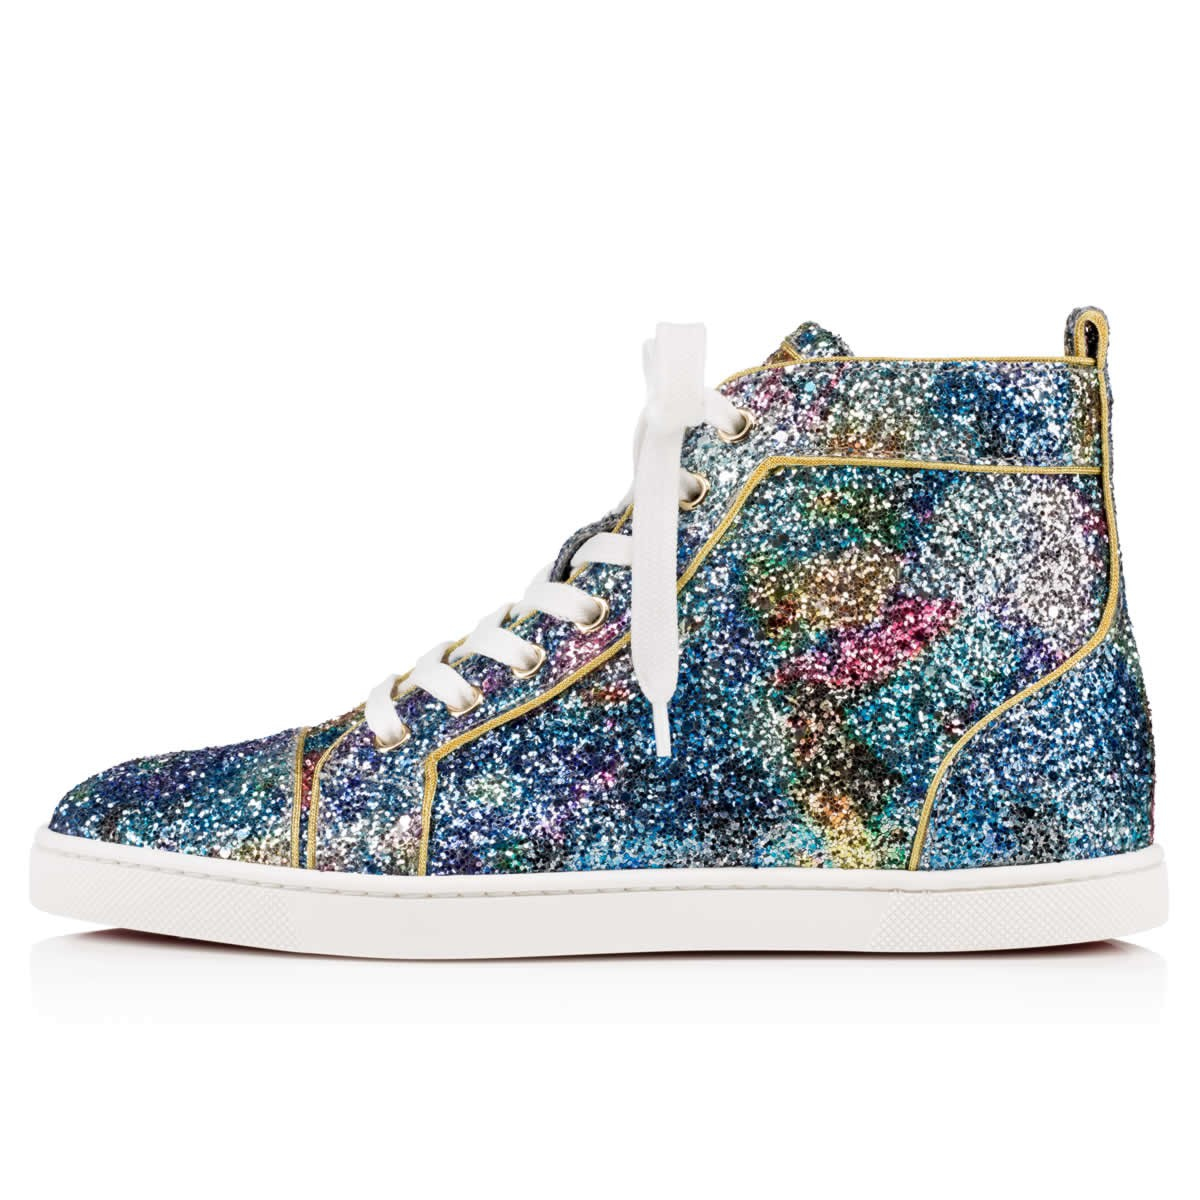 e06b2f693ab switzerland louboutin gold glitter sneakers zip d0fc1 4677b